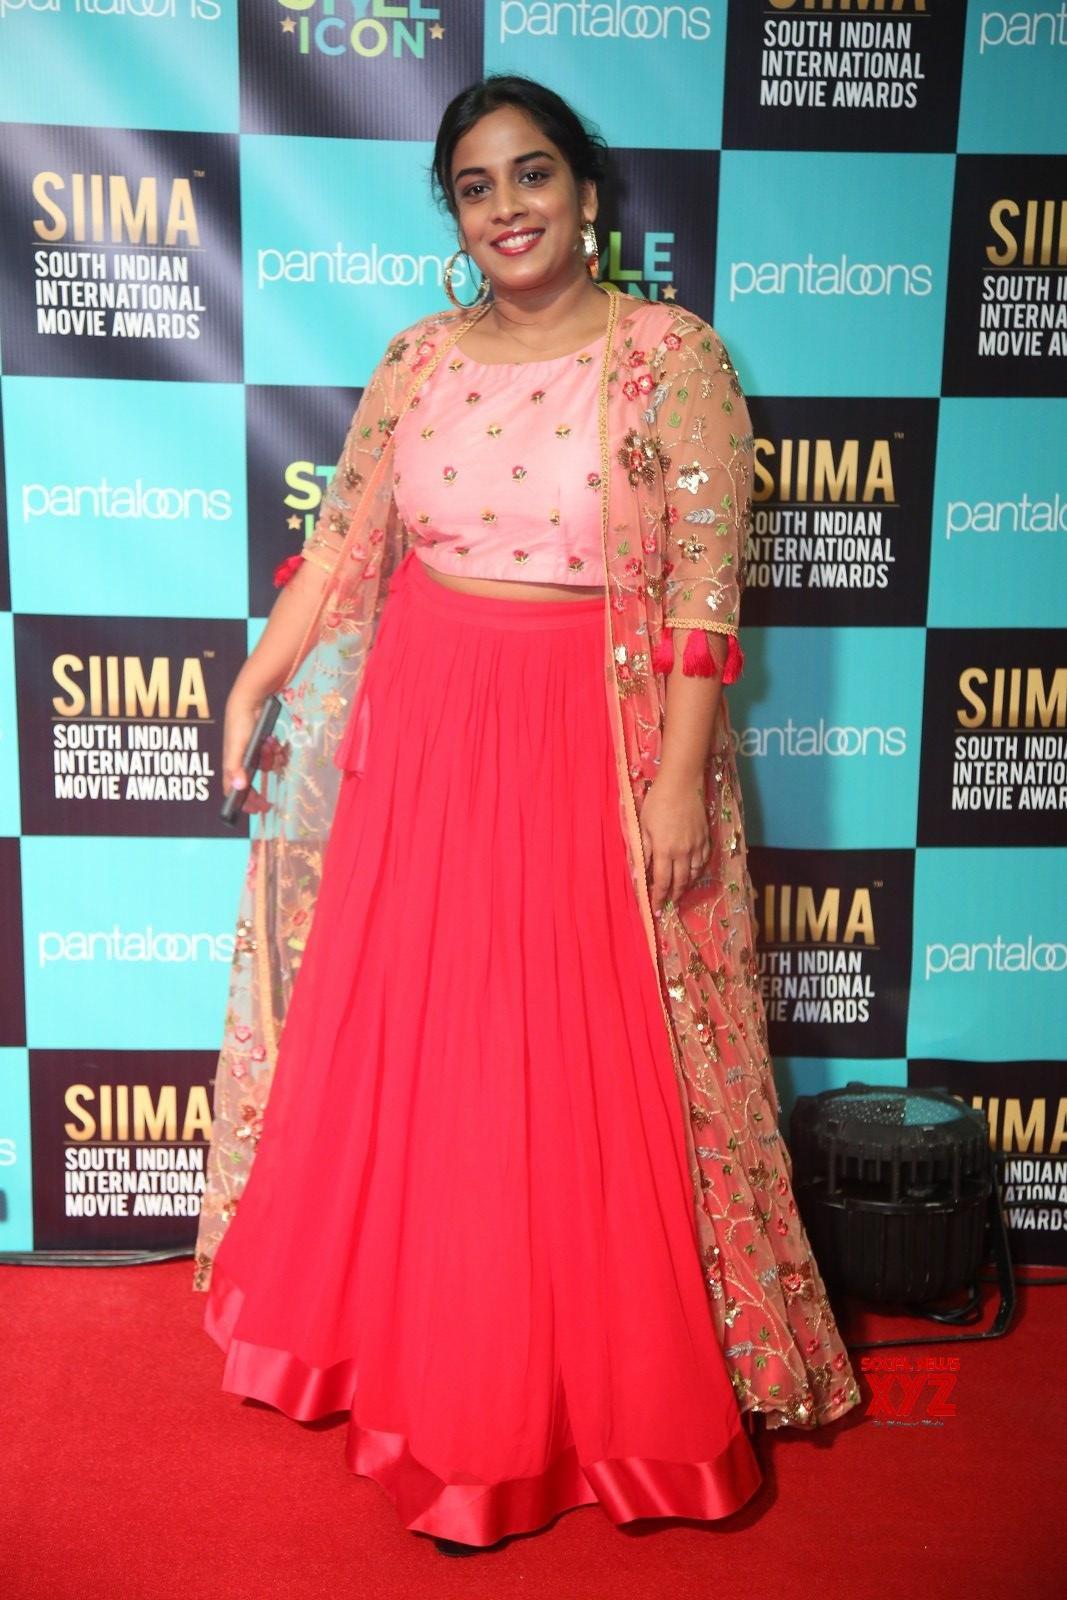 Celebs At SIIMA Awards 2019 Red Carpet In Doha Qatar Gallery Set 2